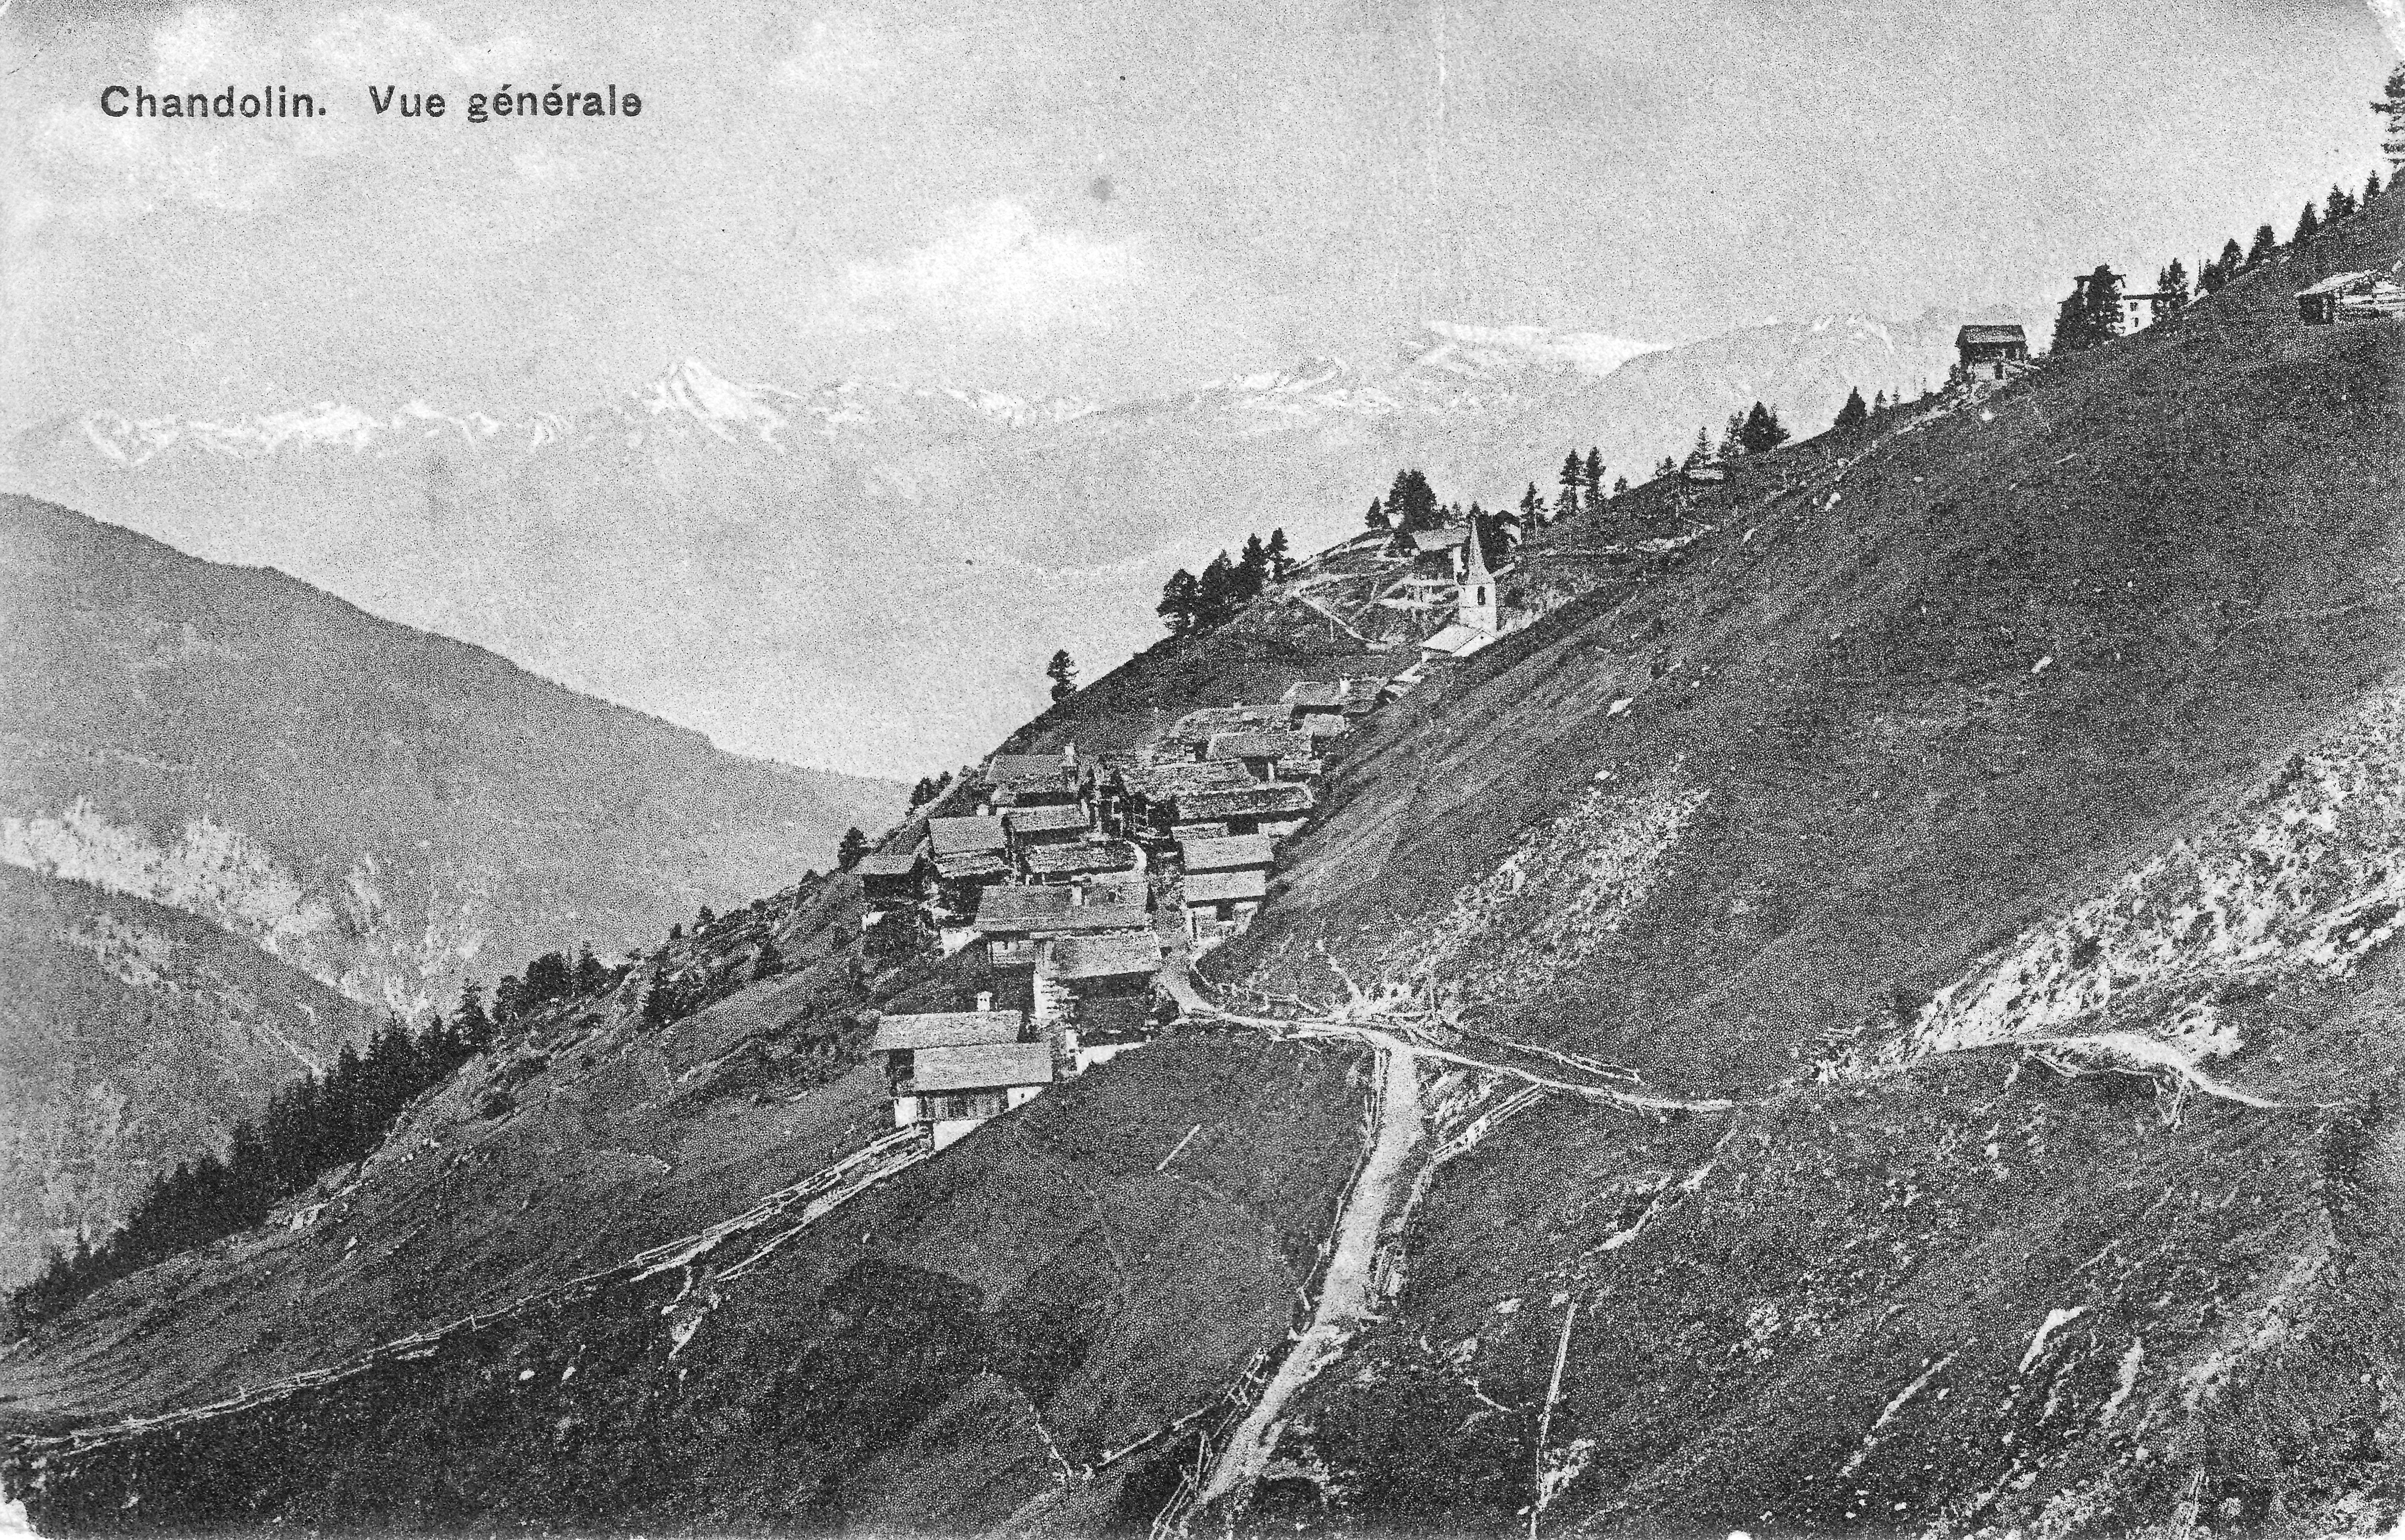 Chandolin vers 1910